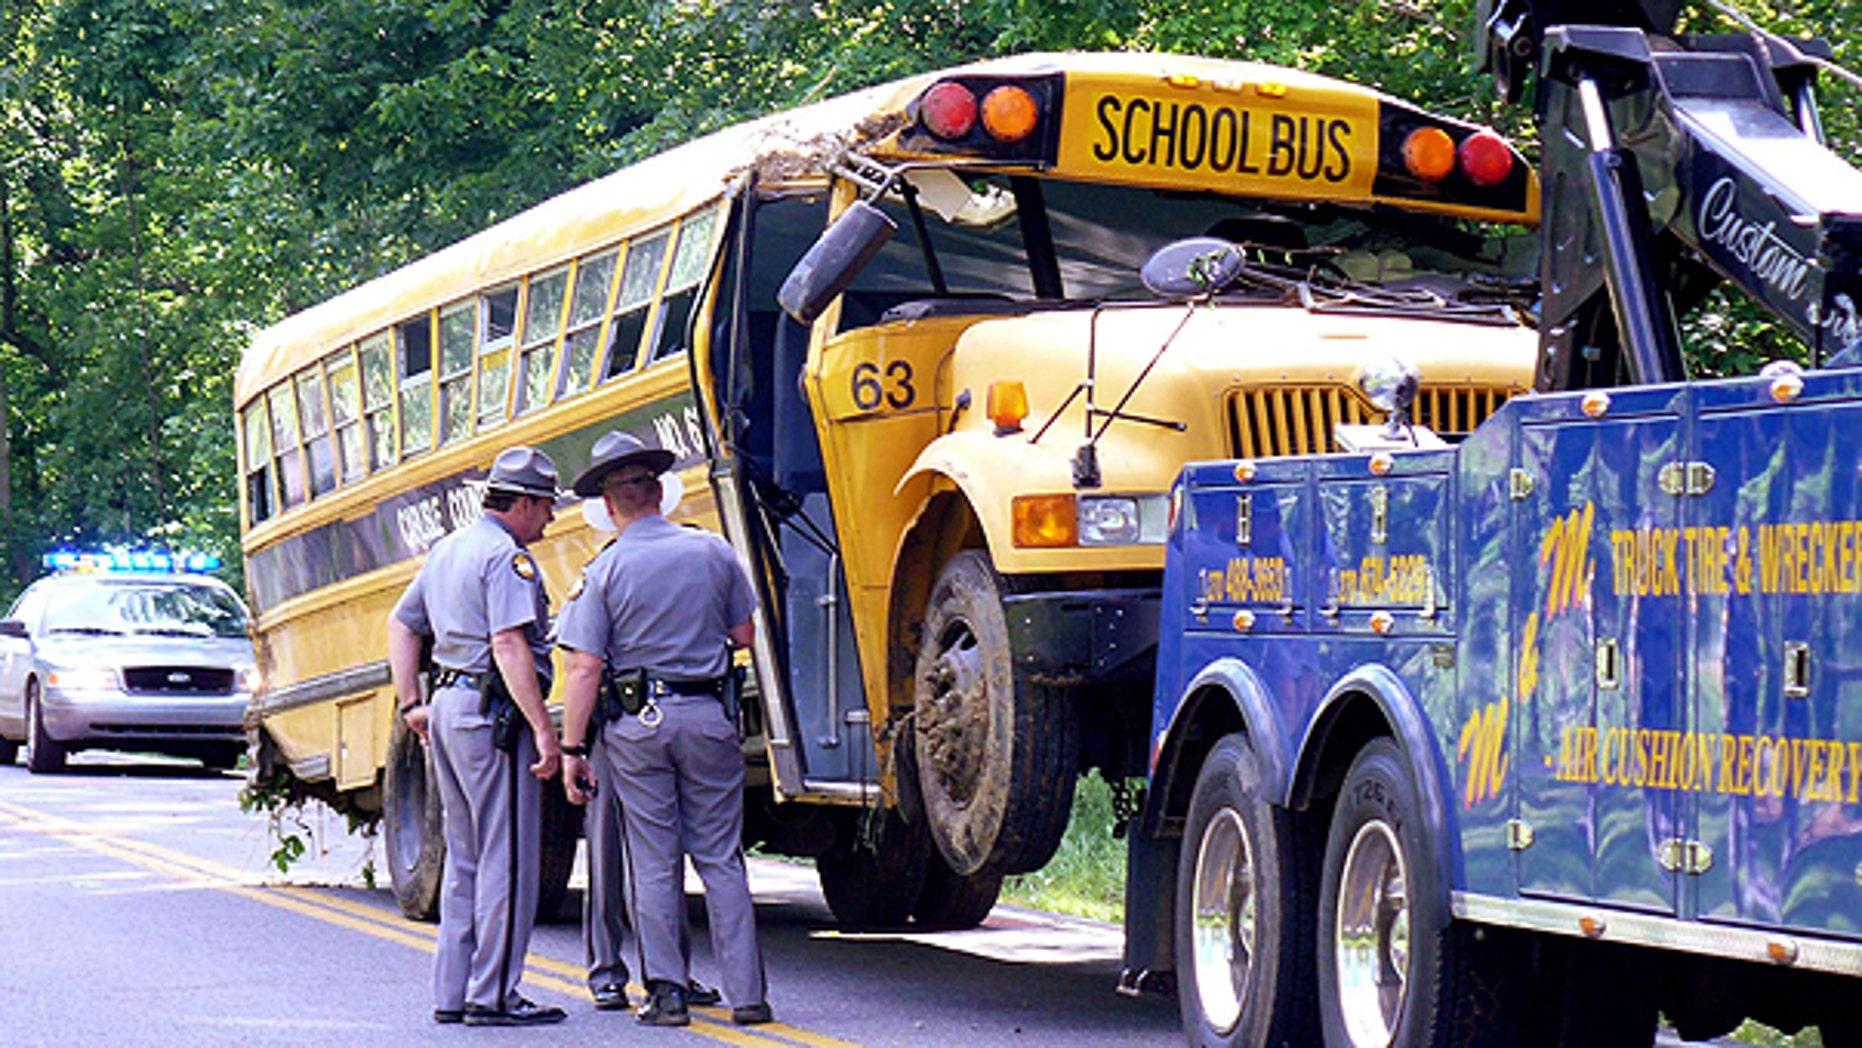 6-year-old killed in W  Kentucky school bus crash | Fox News